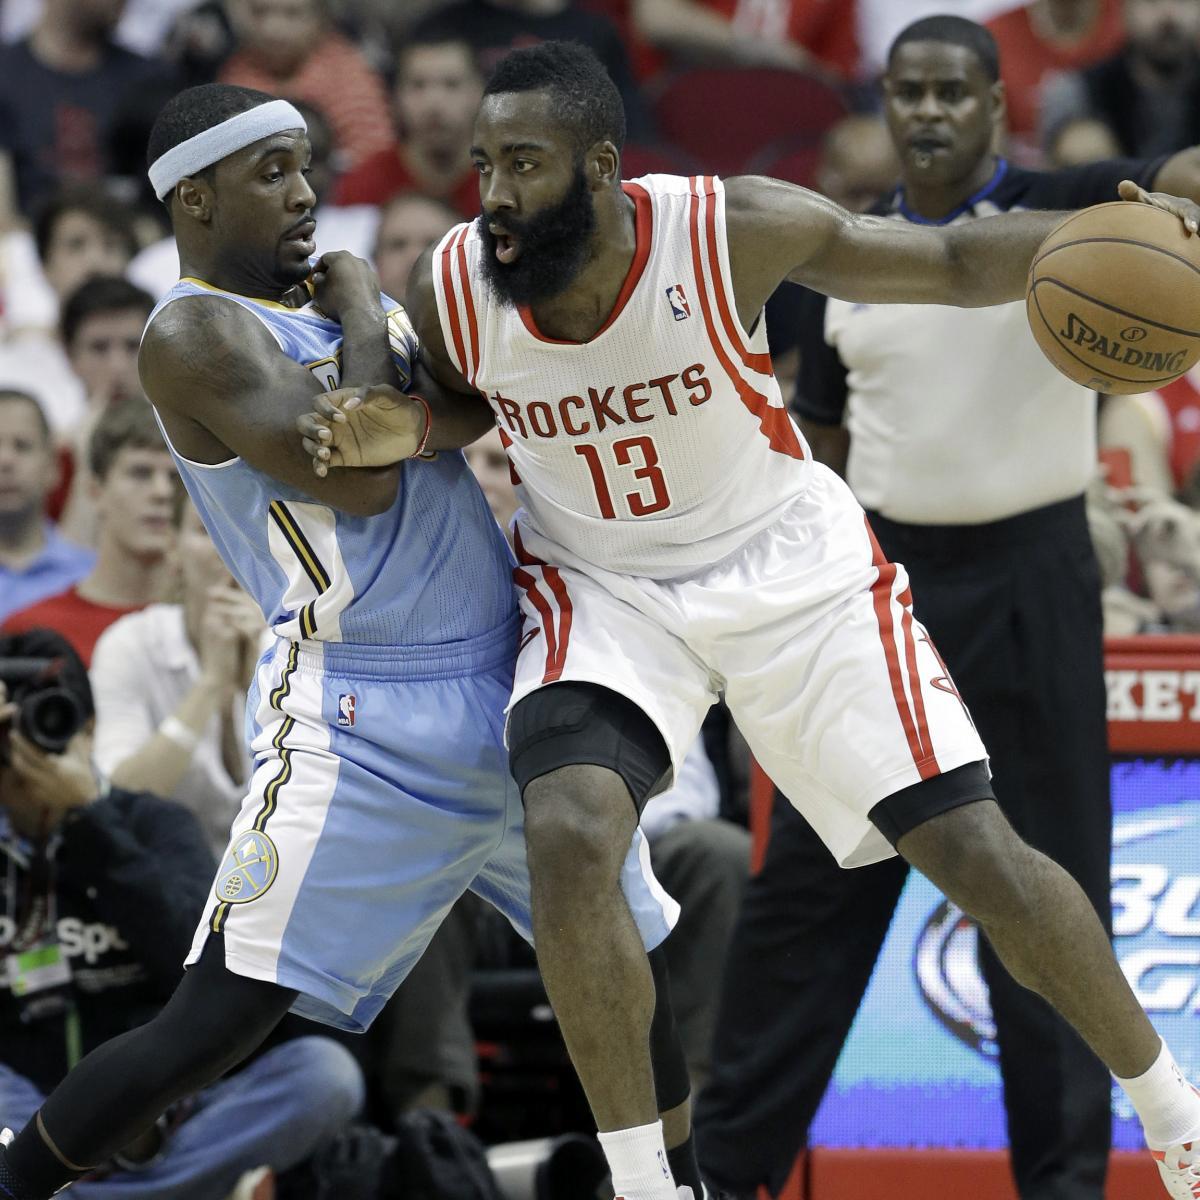 Denver Nuggets Score: Denver Nuggets Vs. Houston Rockets: Live Score And